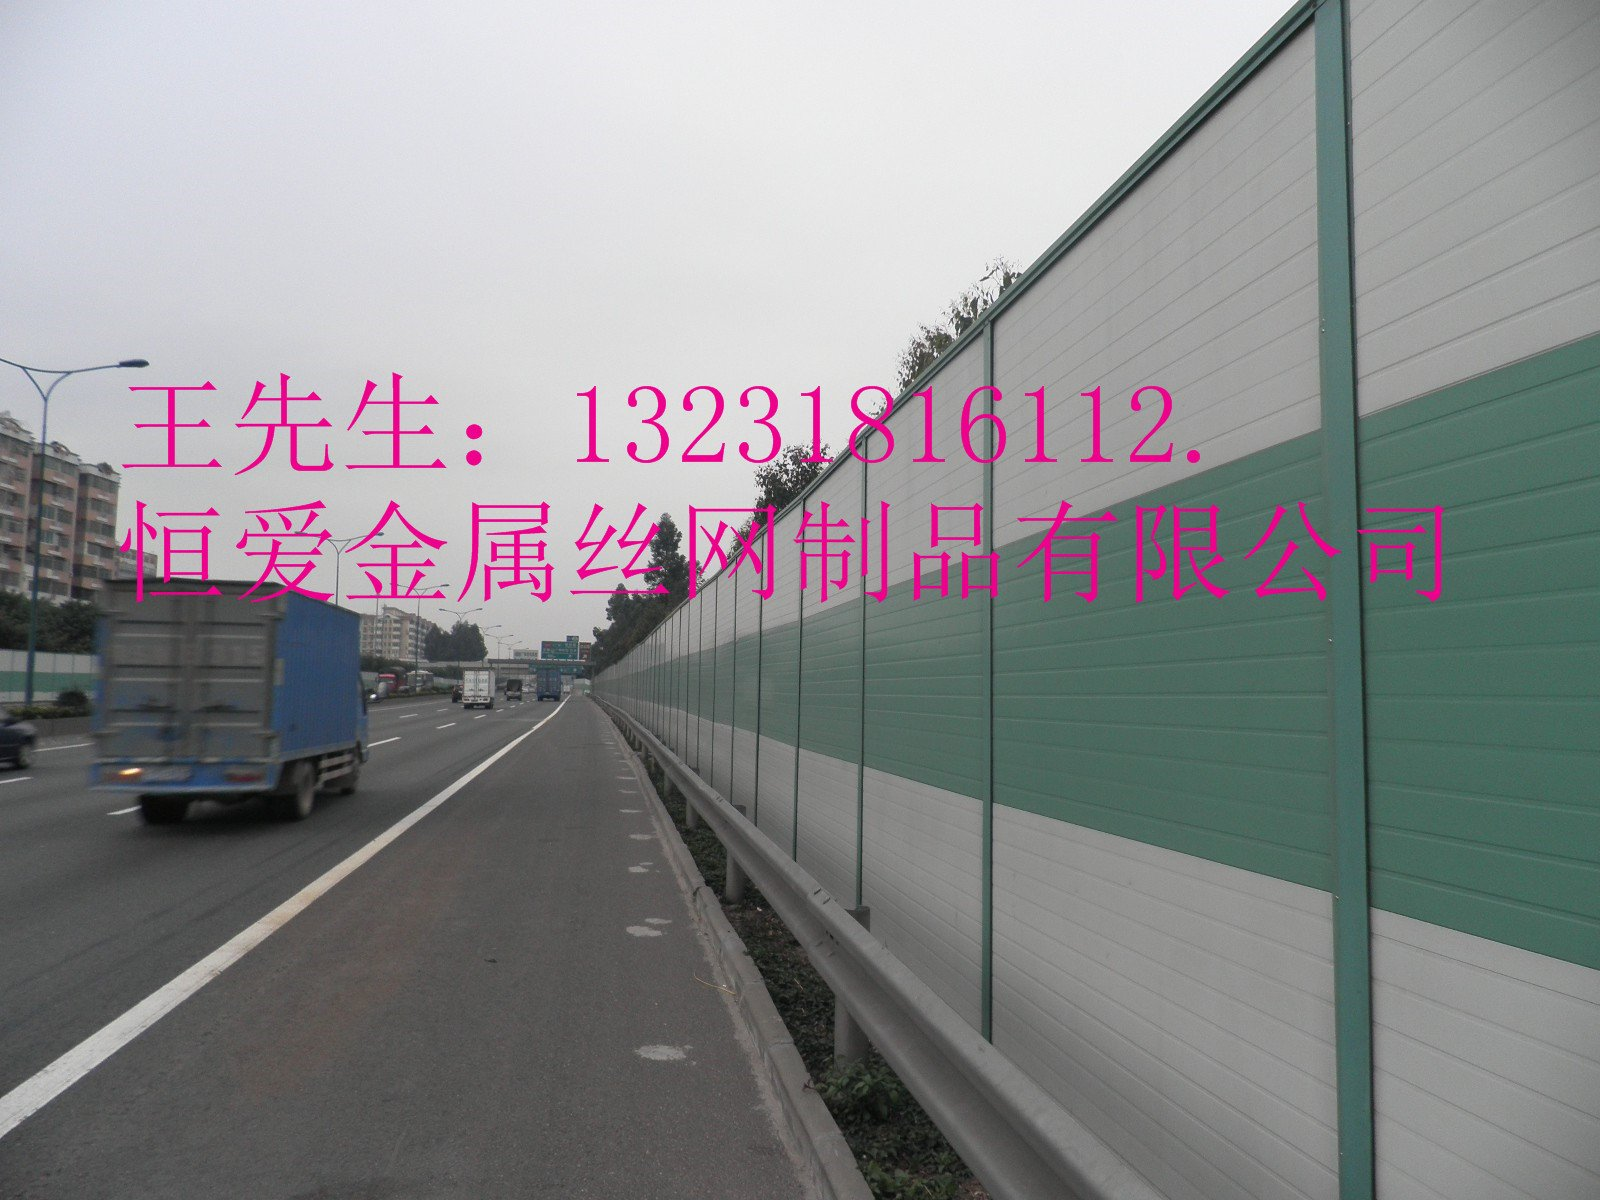 1-1411261530314a.jpg